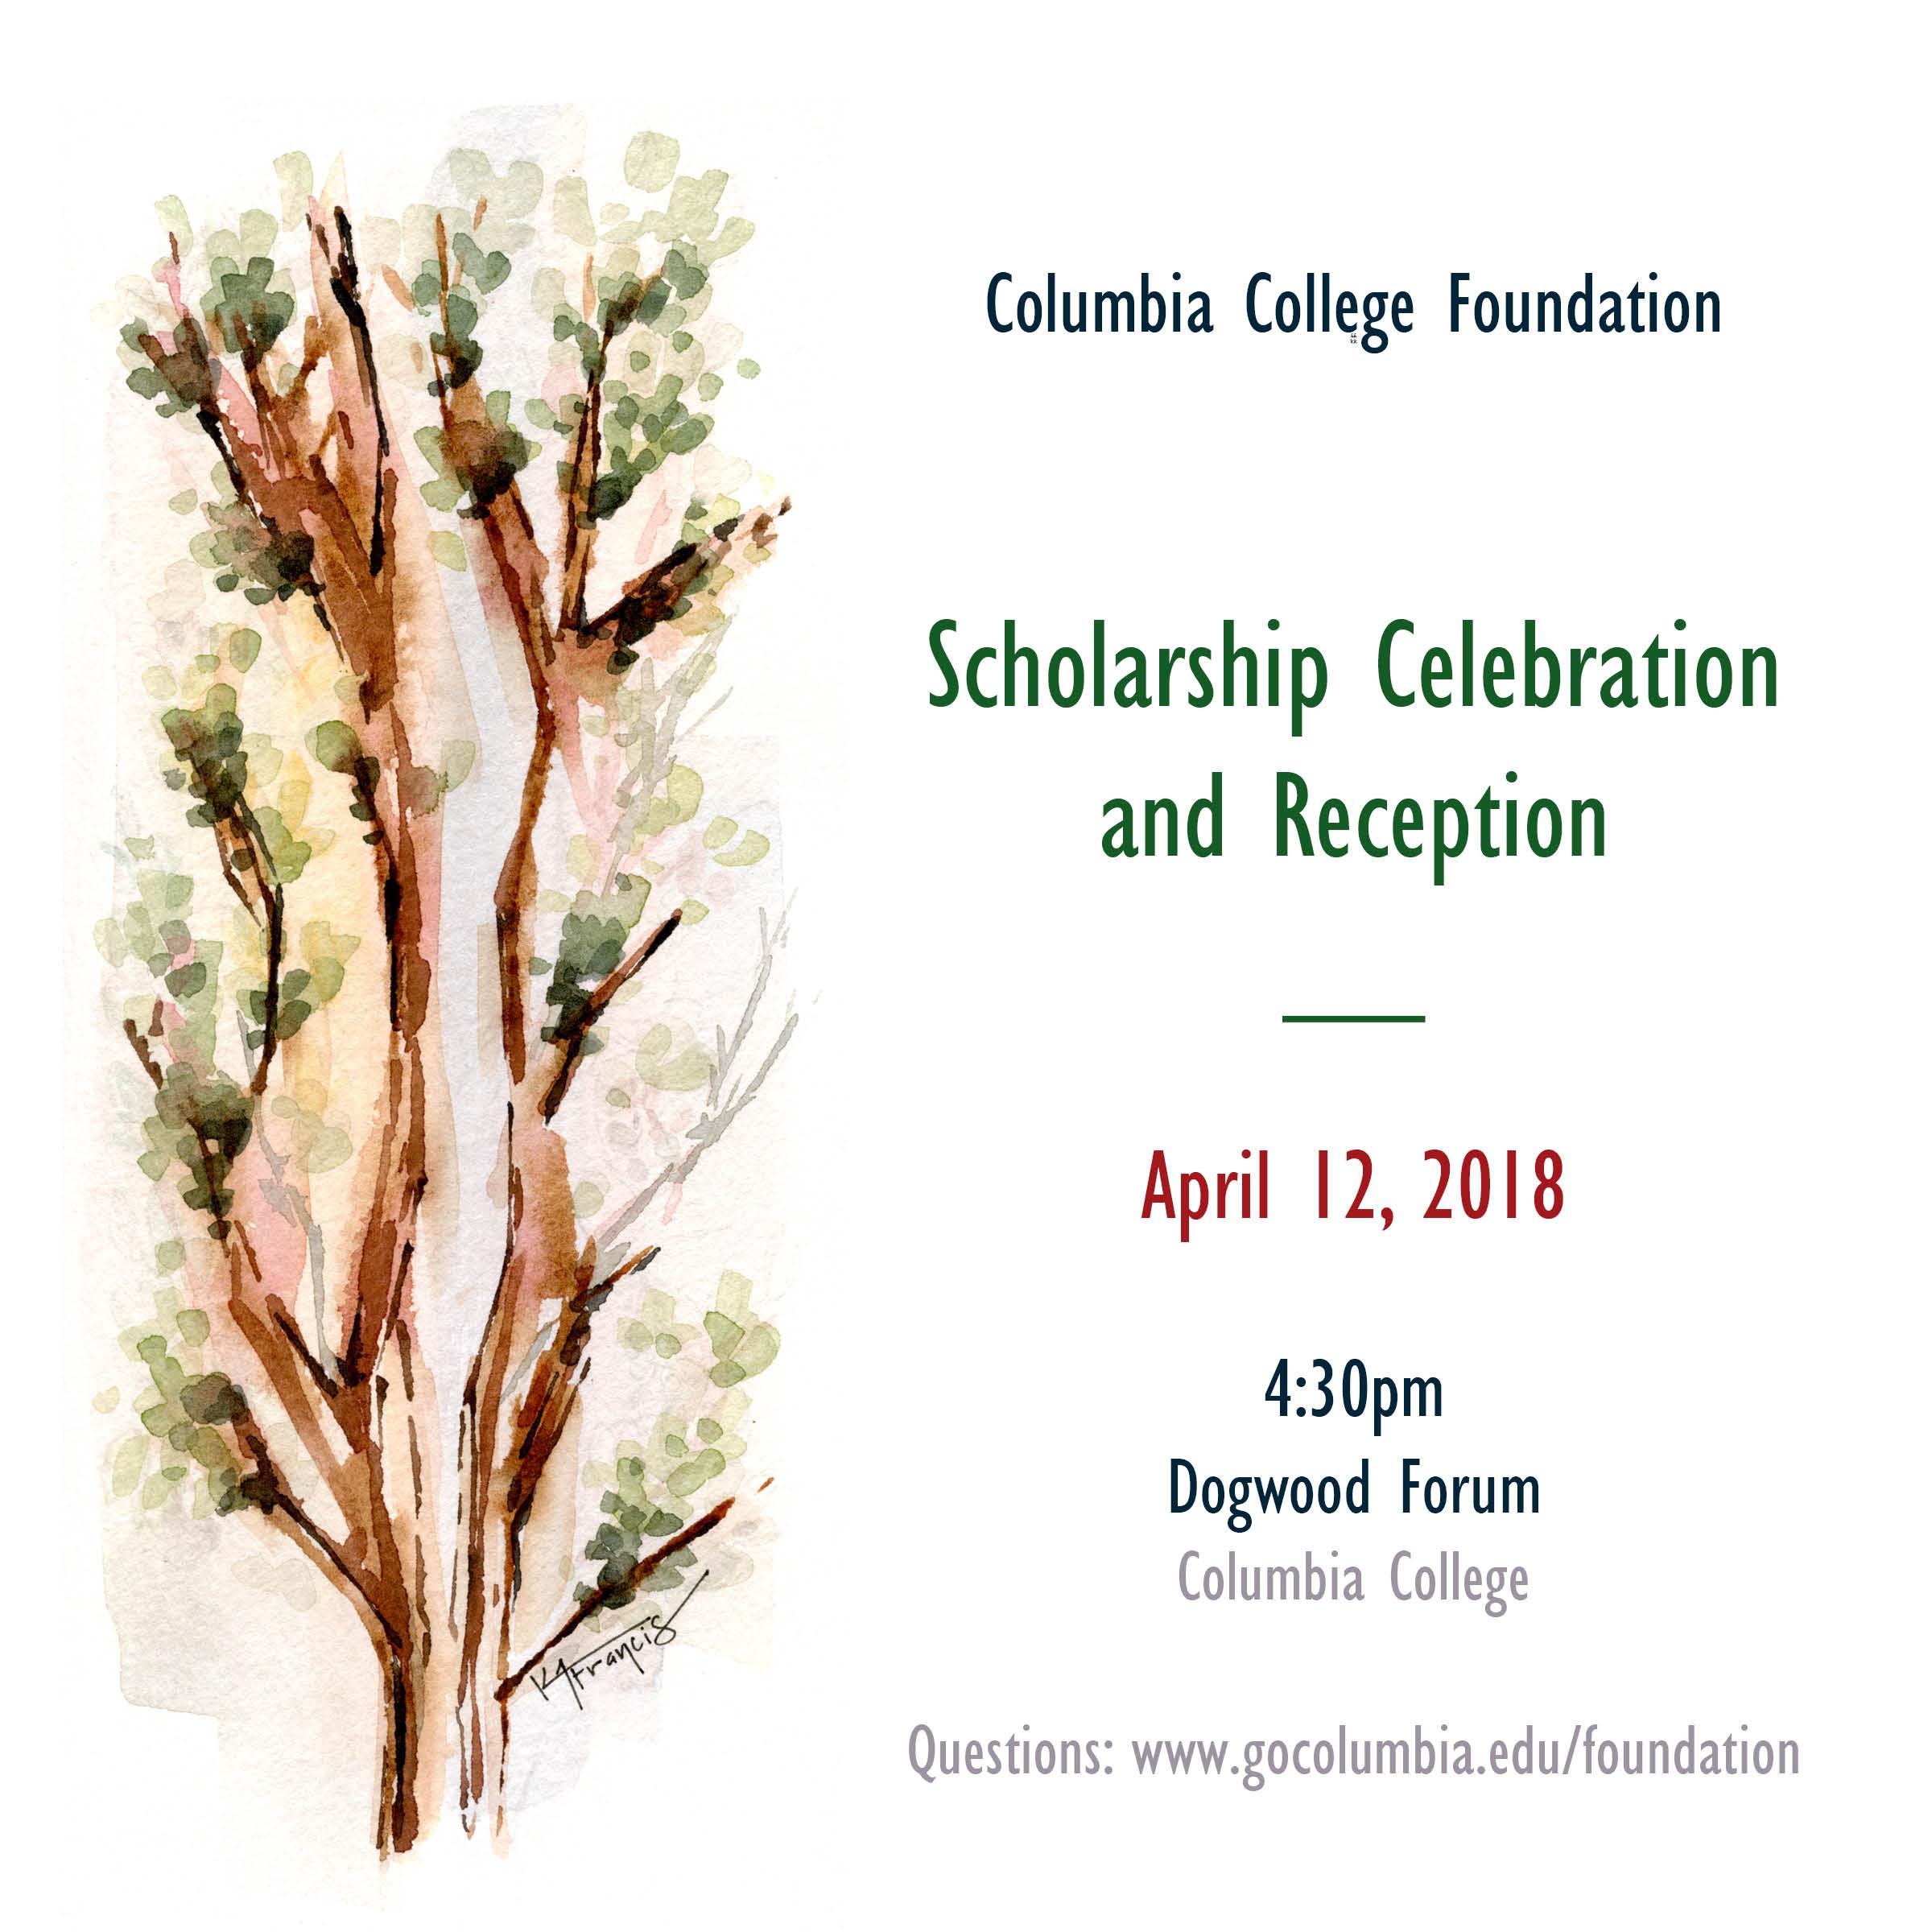 2018 Scholarship Celebration